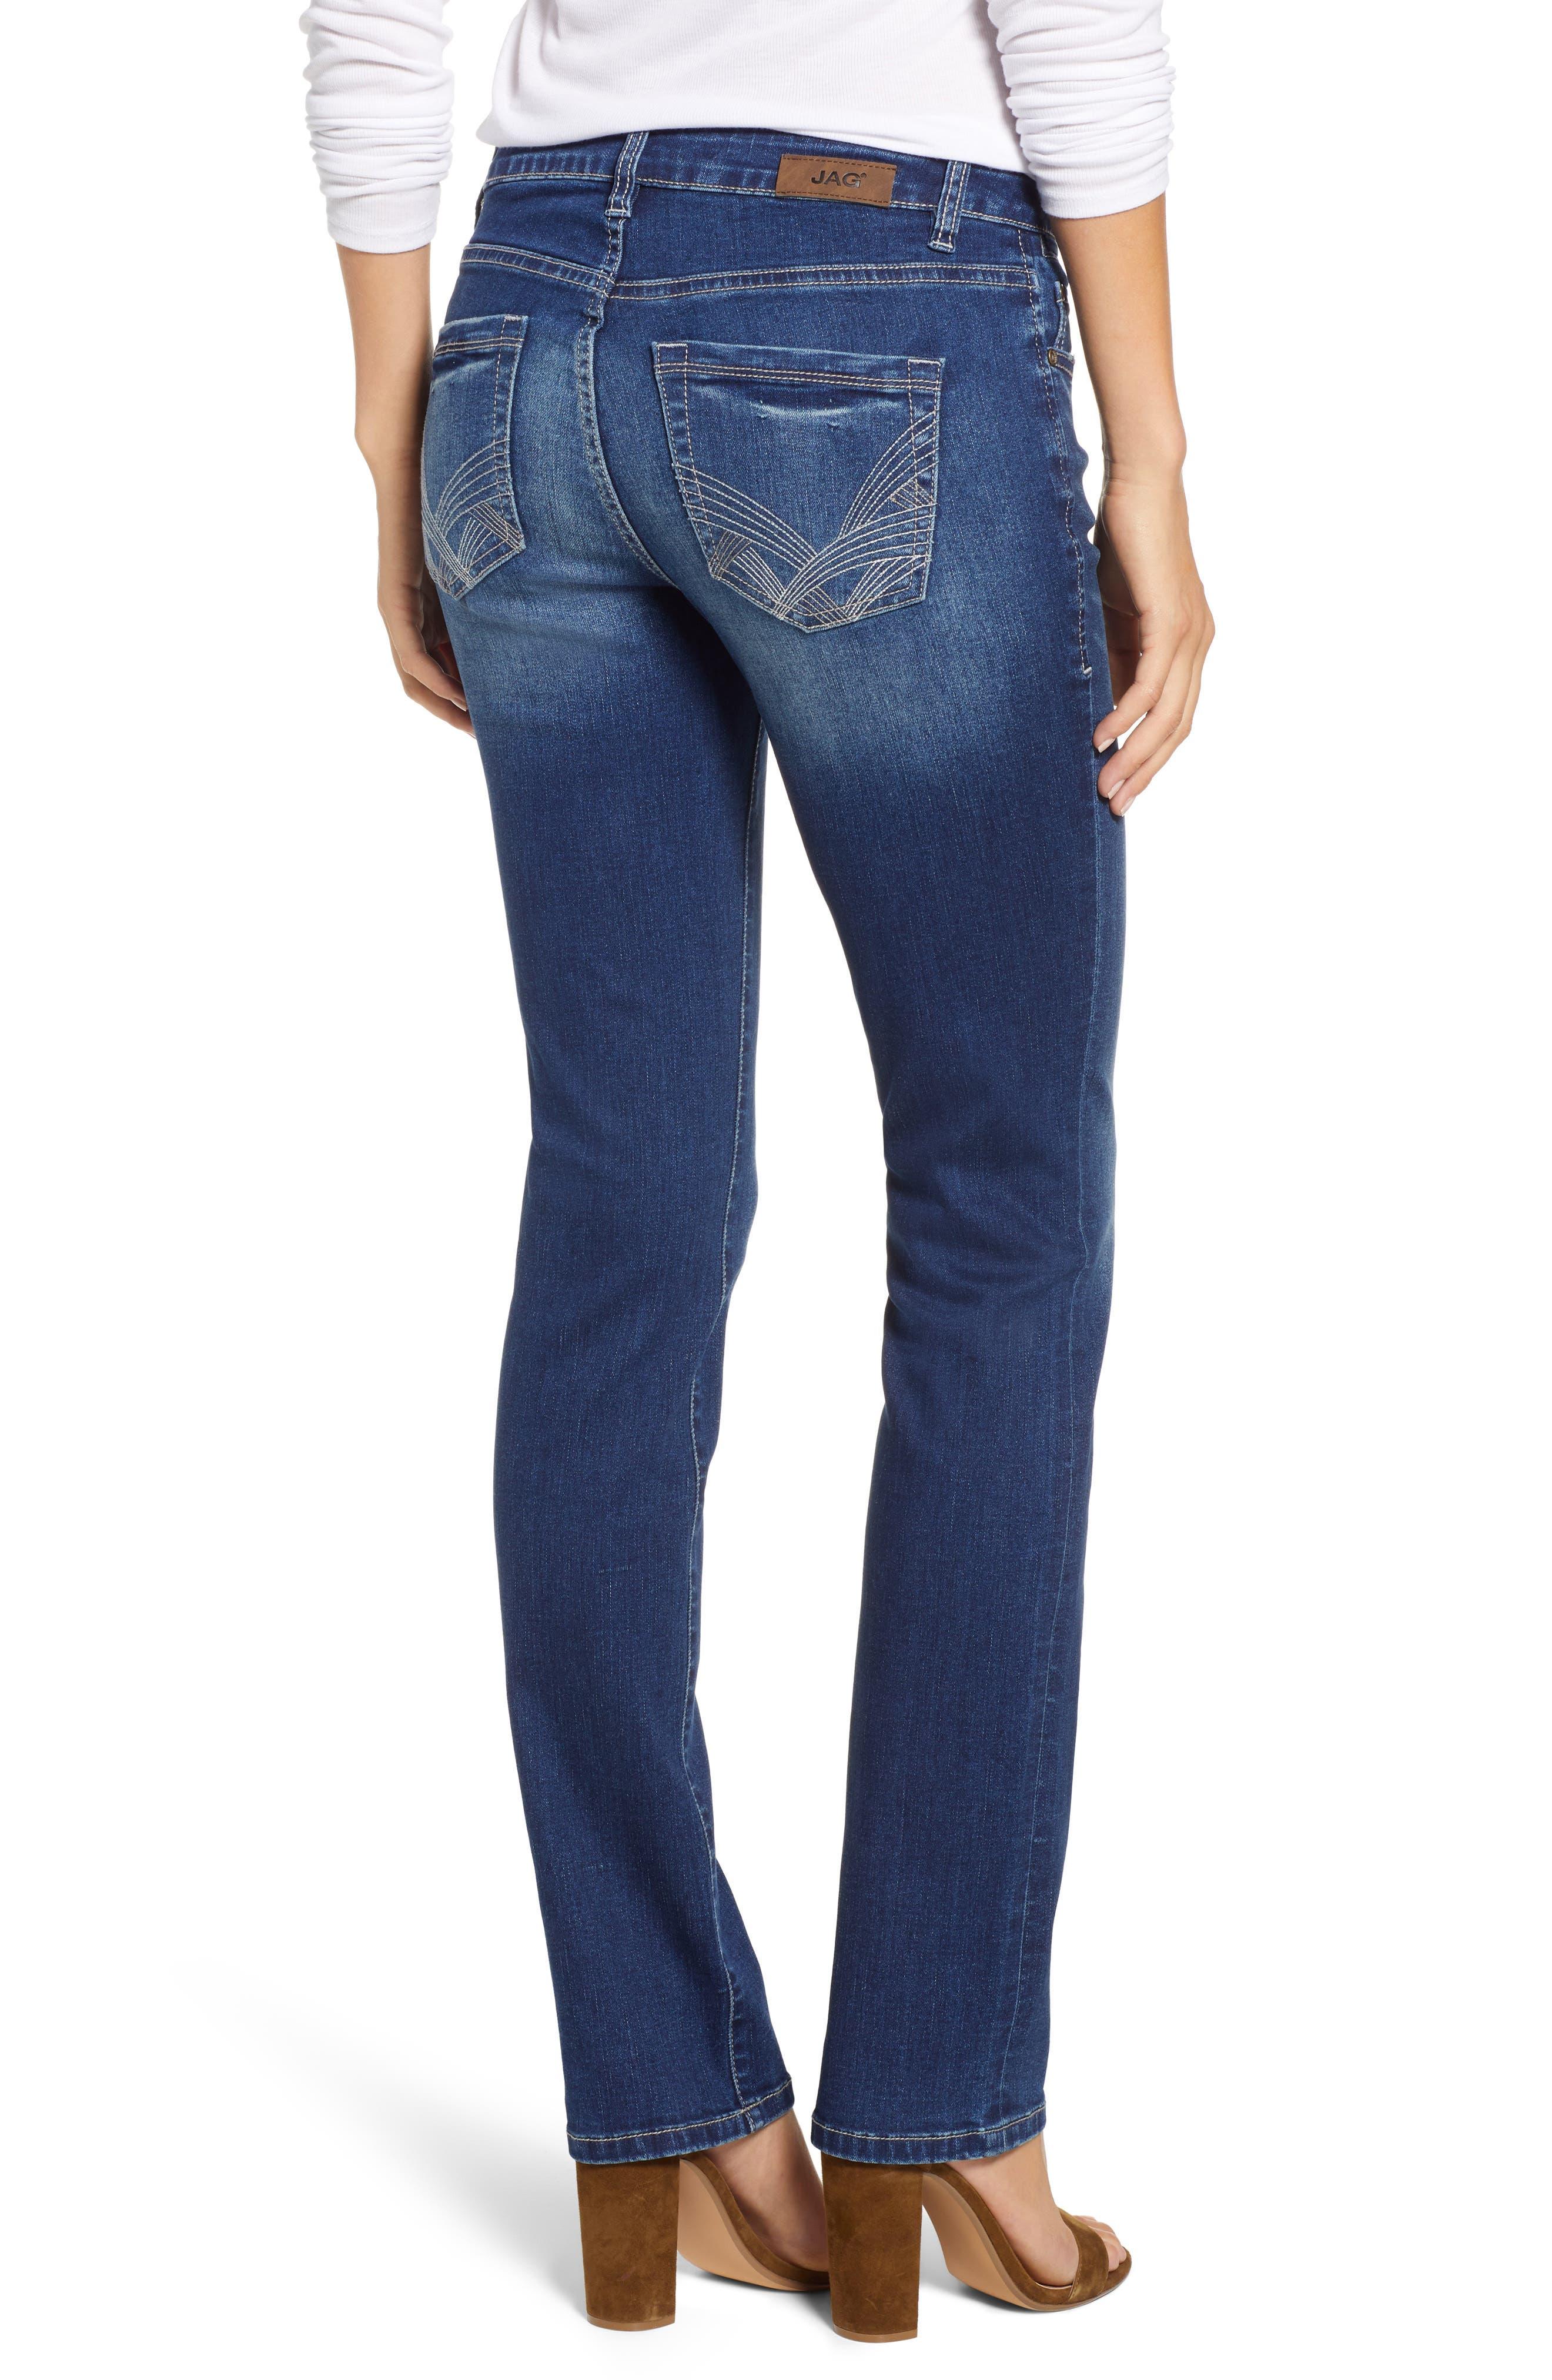 JAG JEANS, Hanna Stretch Straight Leg Jeans, Alternate thumbnail 2, color, MED INDIGO